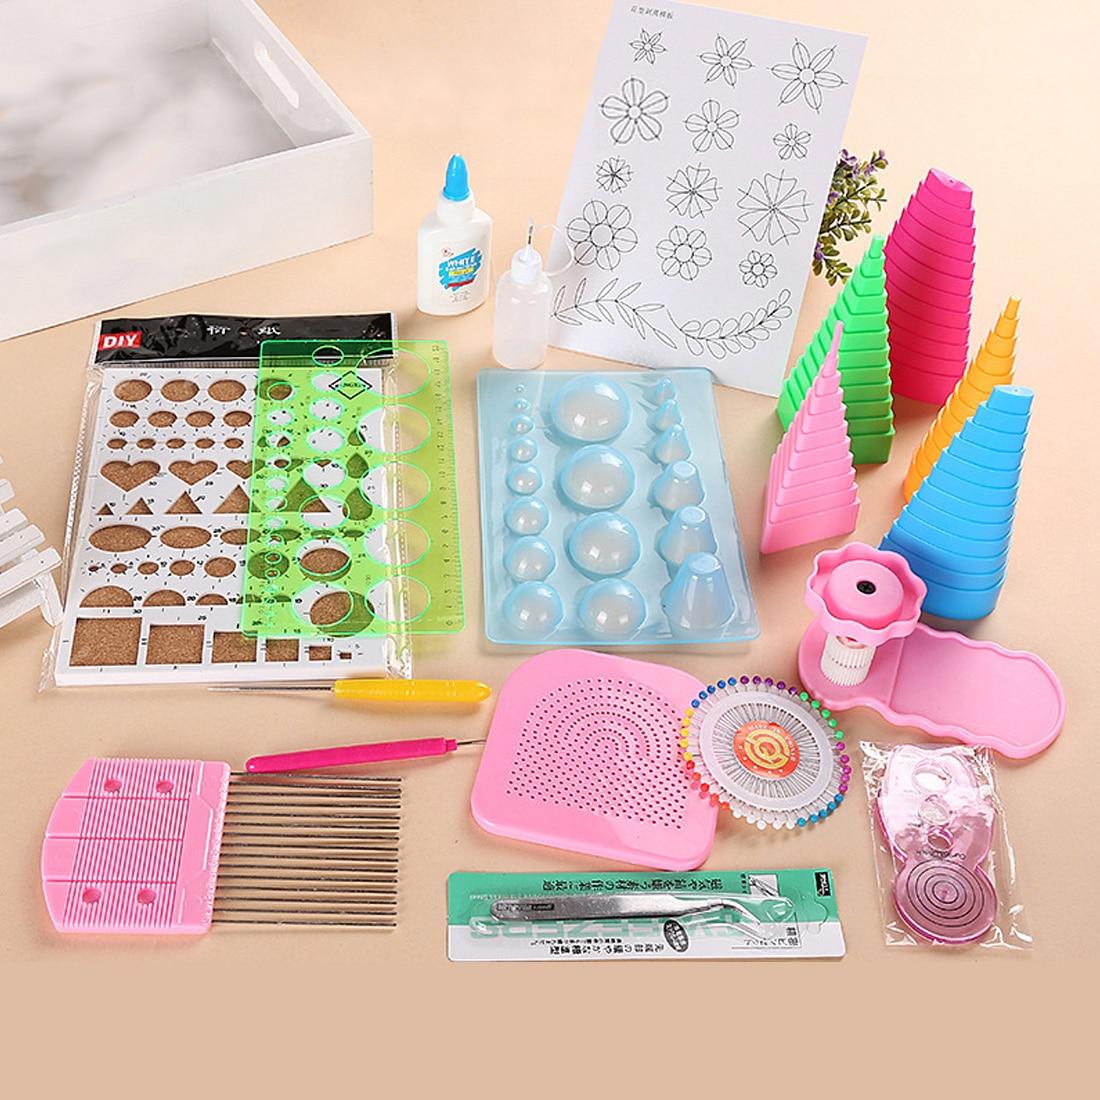 1Set Handmade Tweezer Crimping Paper Craft Quilling Paper Art Set Starter Quilling Tools Kit Climper Tool Tower DIY Scrapbooking